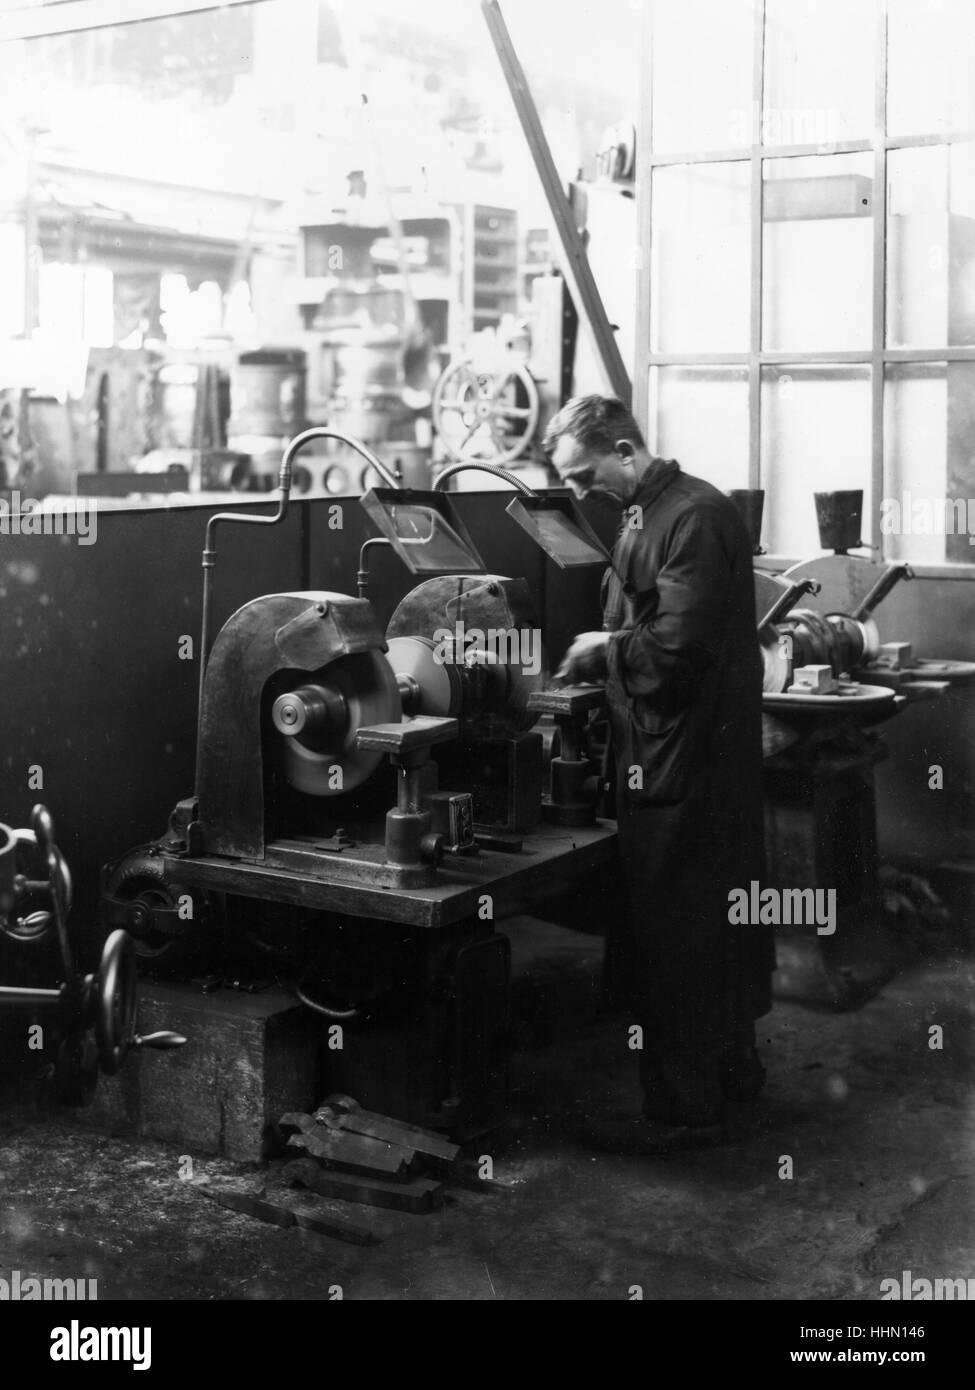 1930 - 40. Fiat - Ansaldo grande fabbrica di motori. Immagini Stock